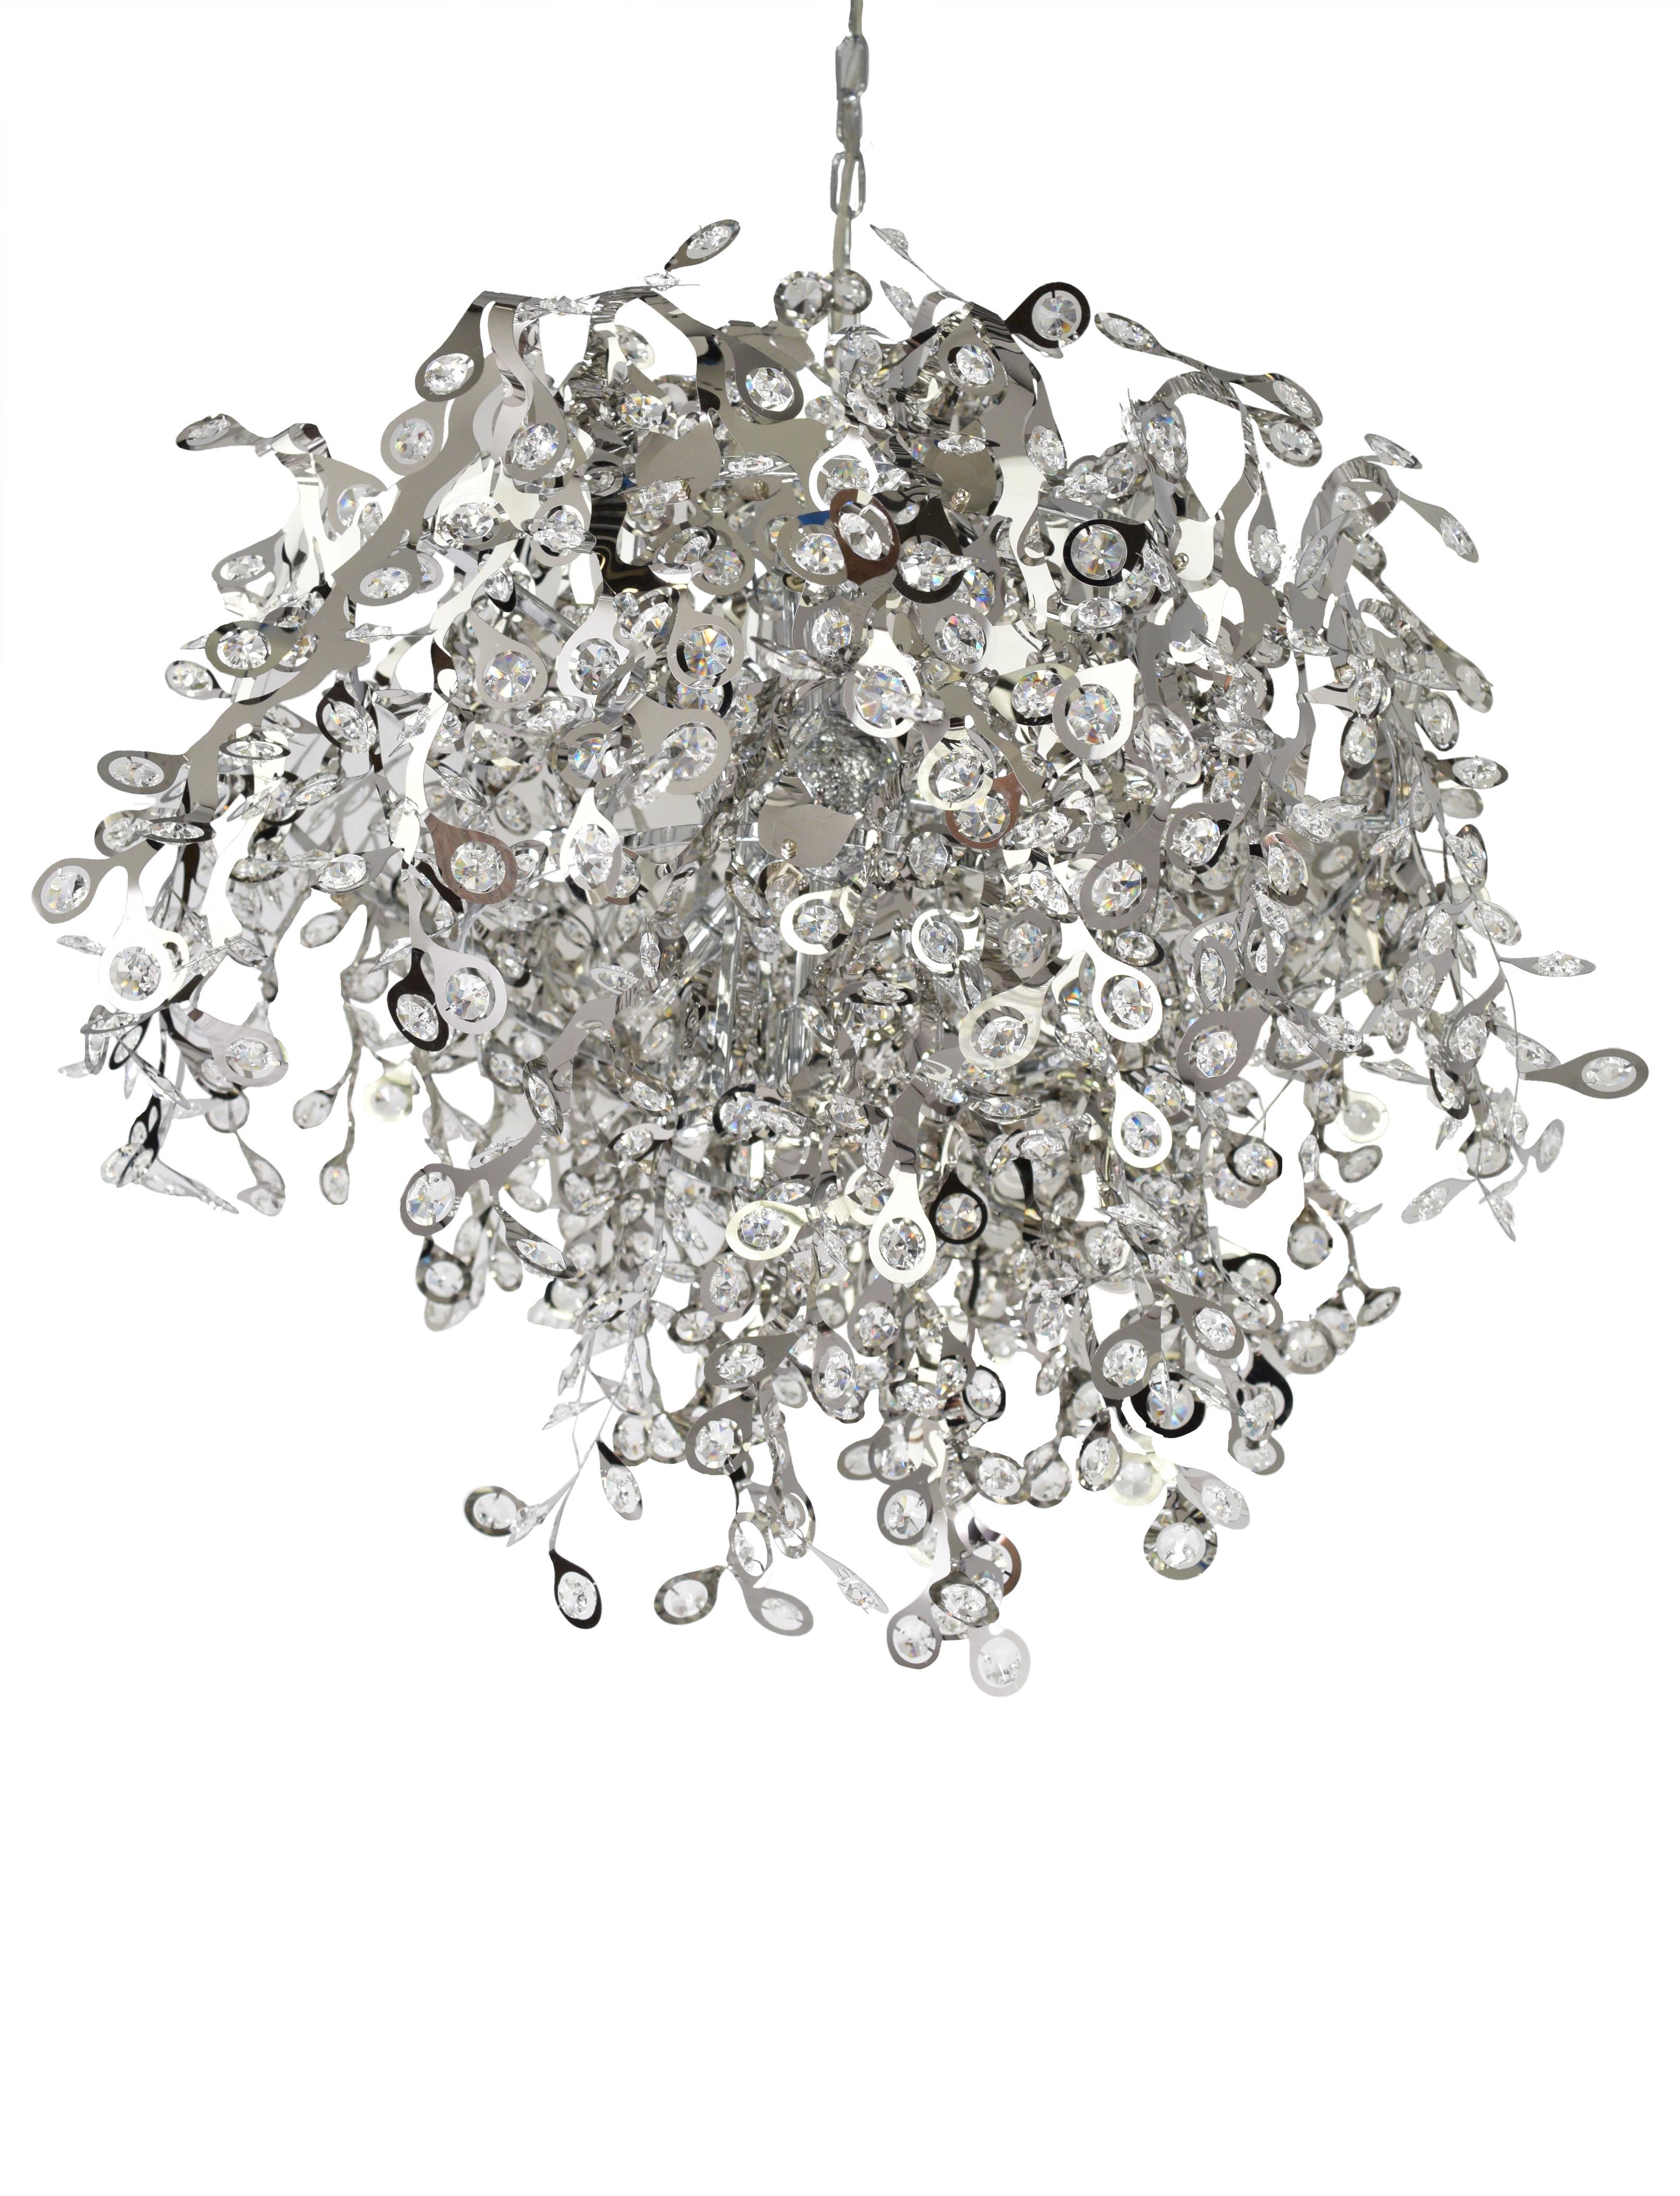 Leonia 10 Light Crystal Chandelier Intended For Most Current Clea 3 Light Crystal Chandeliers (View 14 of 25)